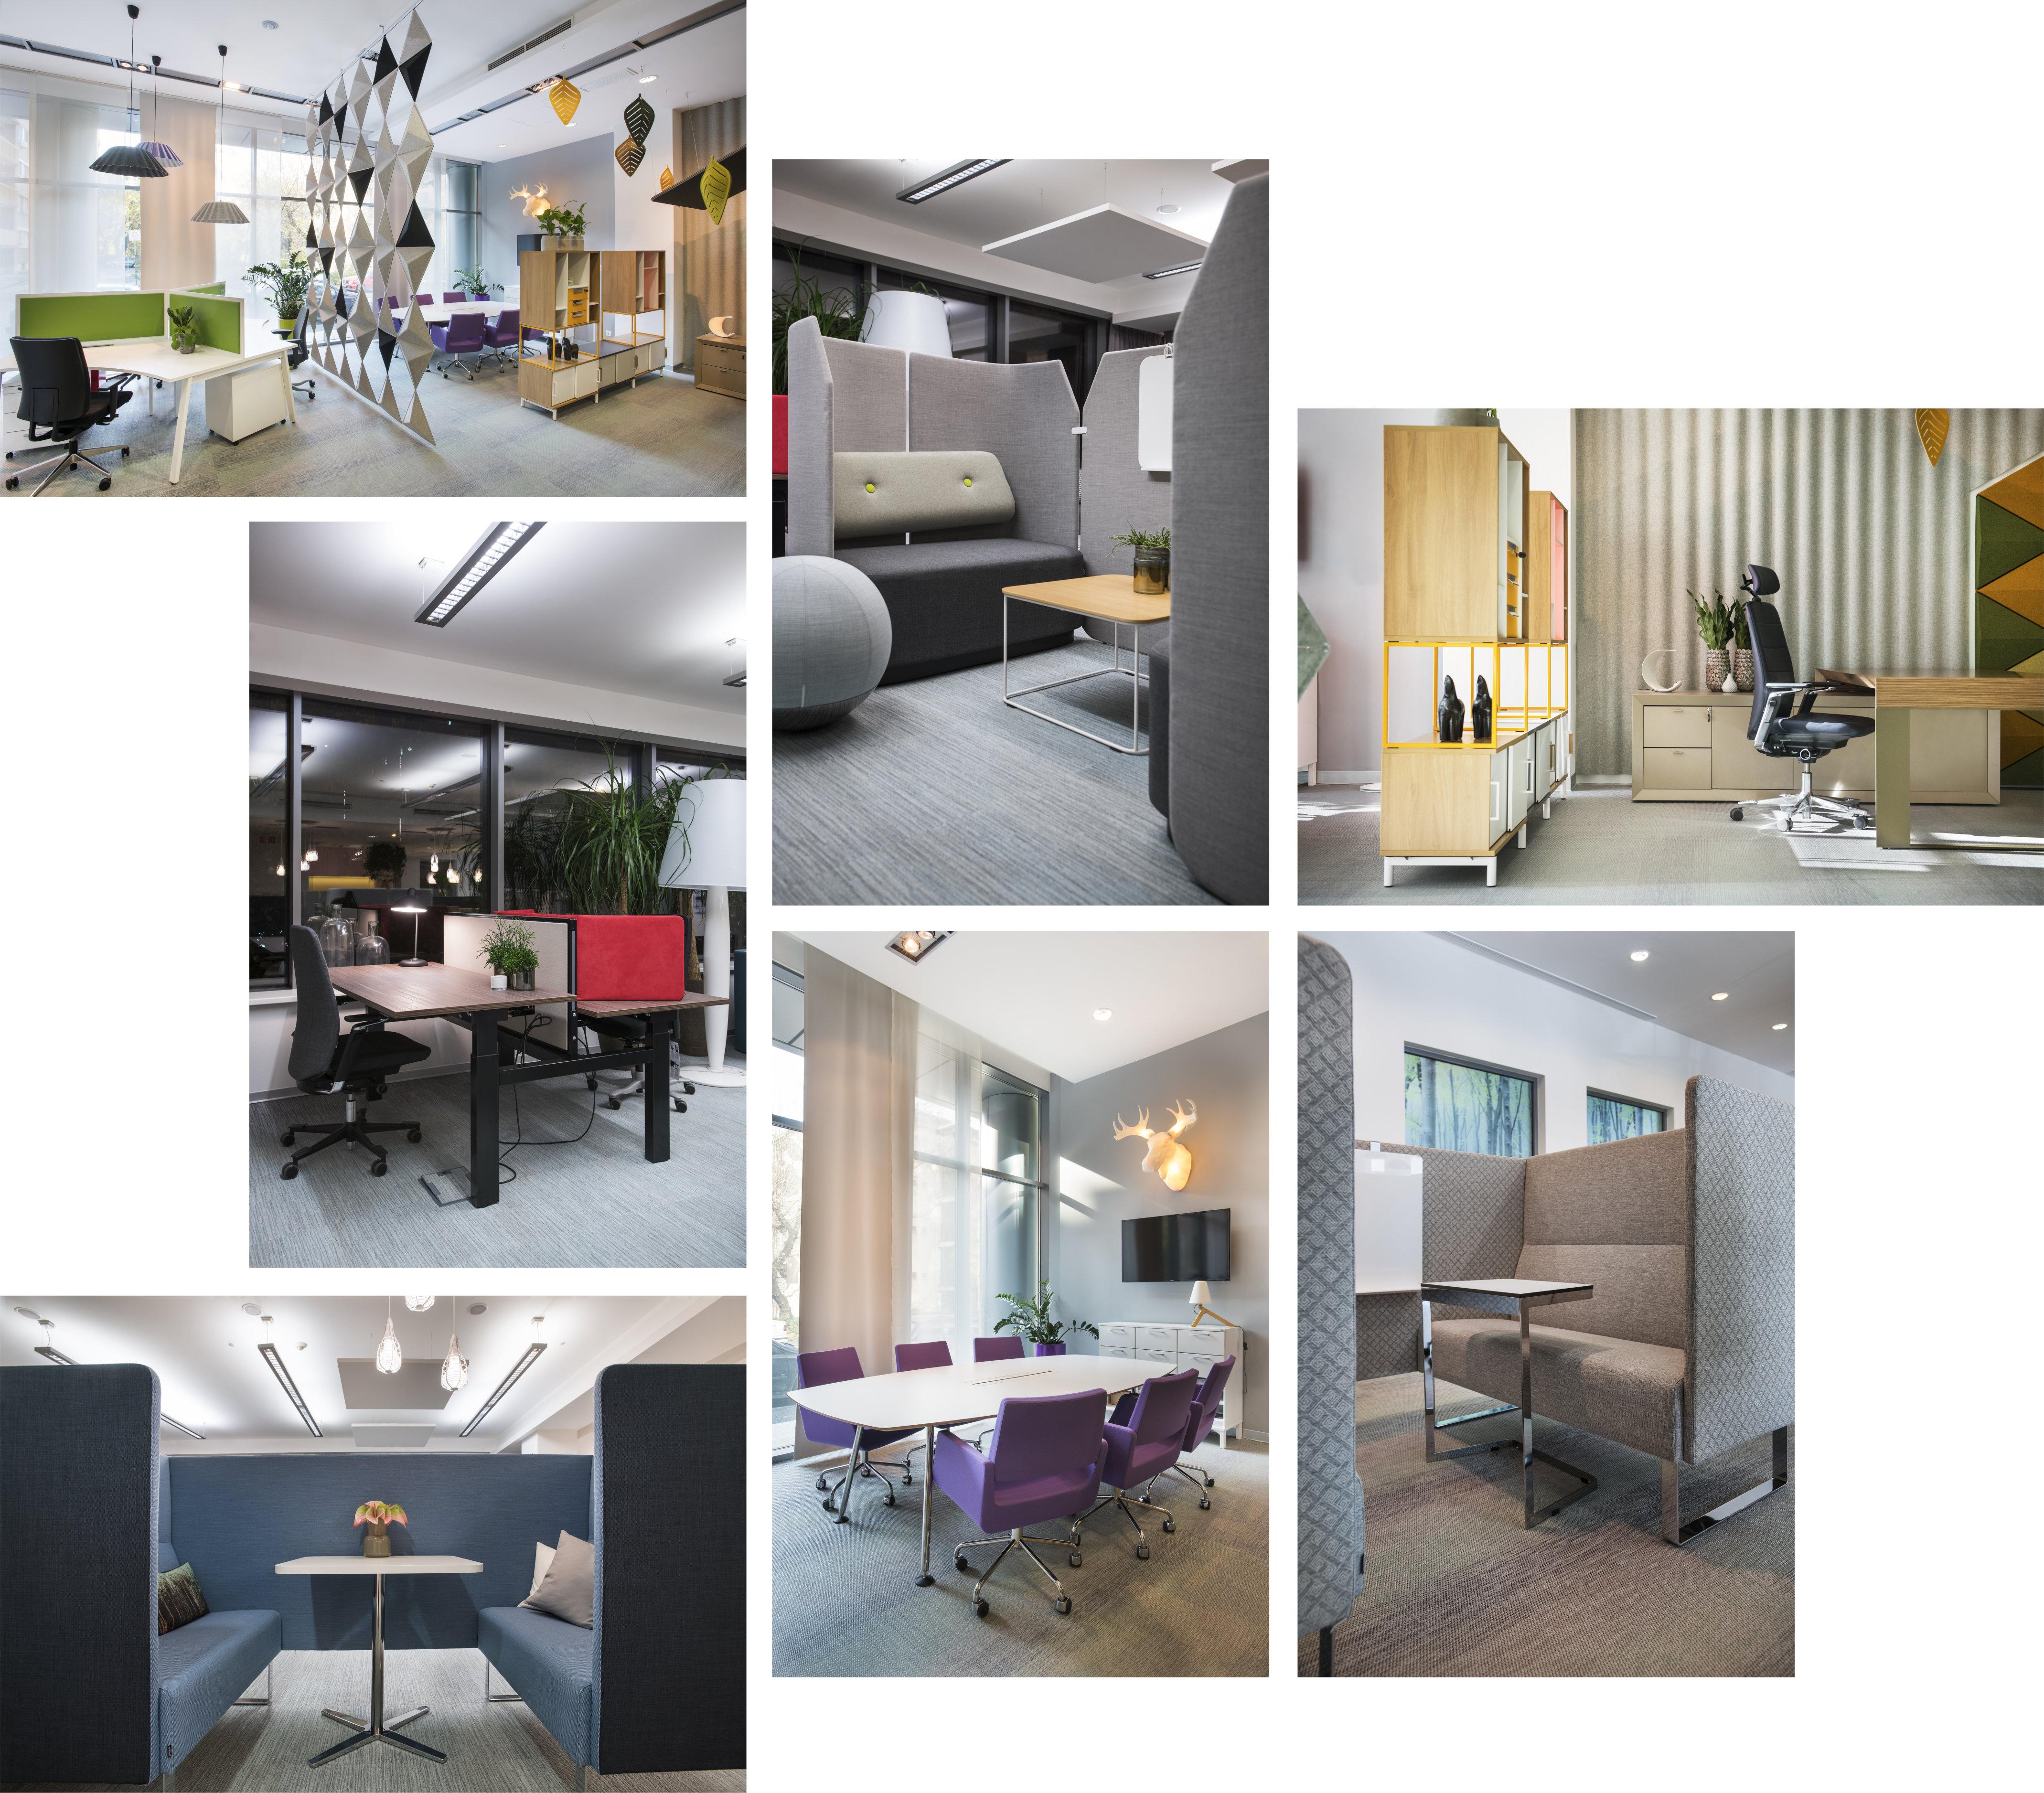 interiorlines_next_office_01_1.jpg